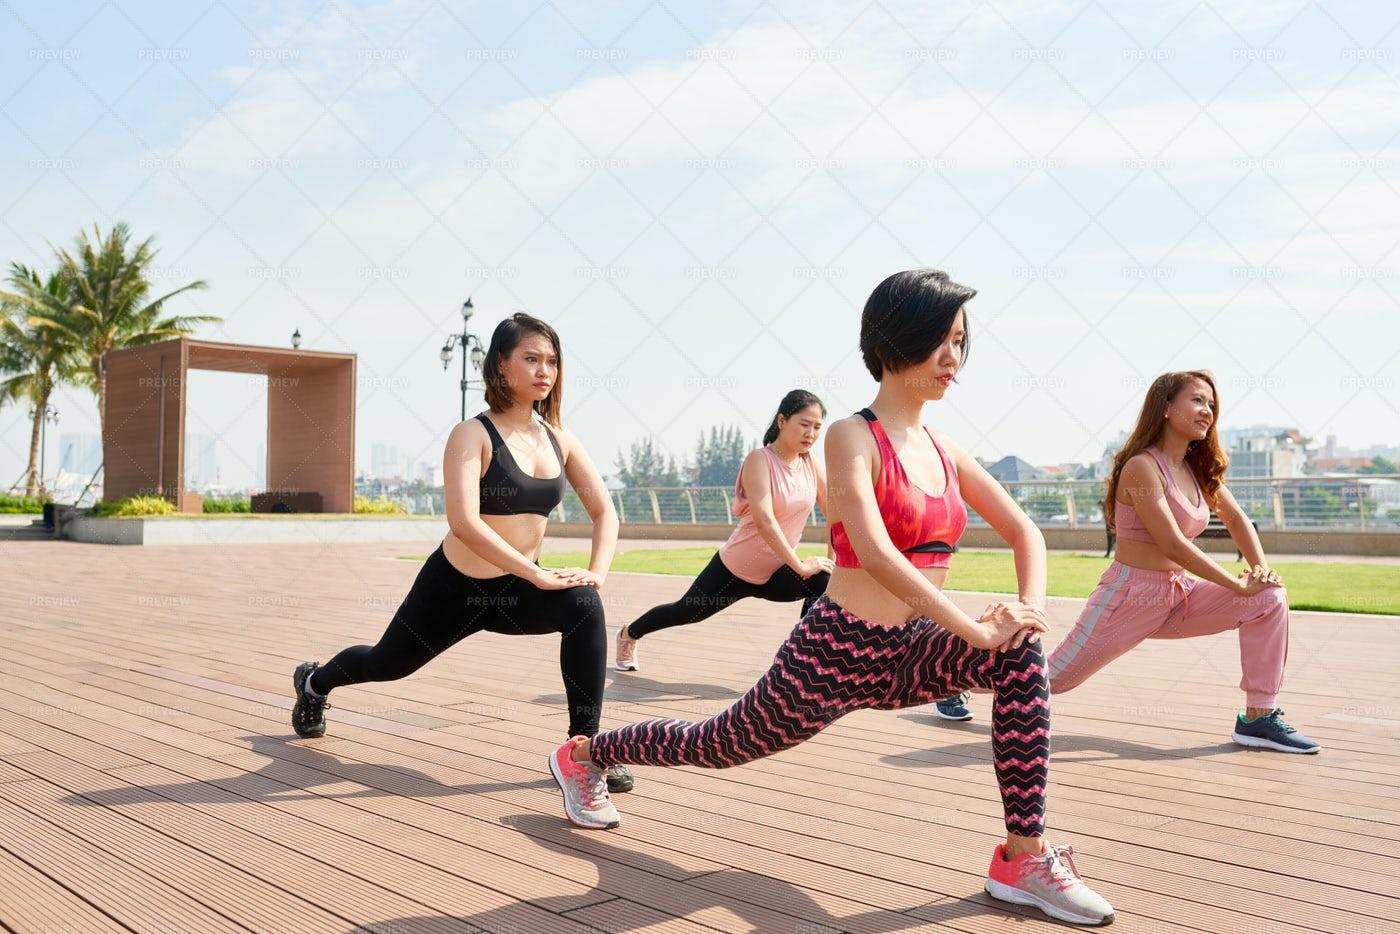 Sportive Woman Doing Yoga Practice: Stock Photos